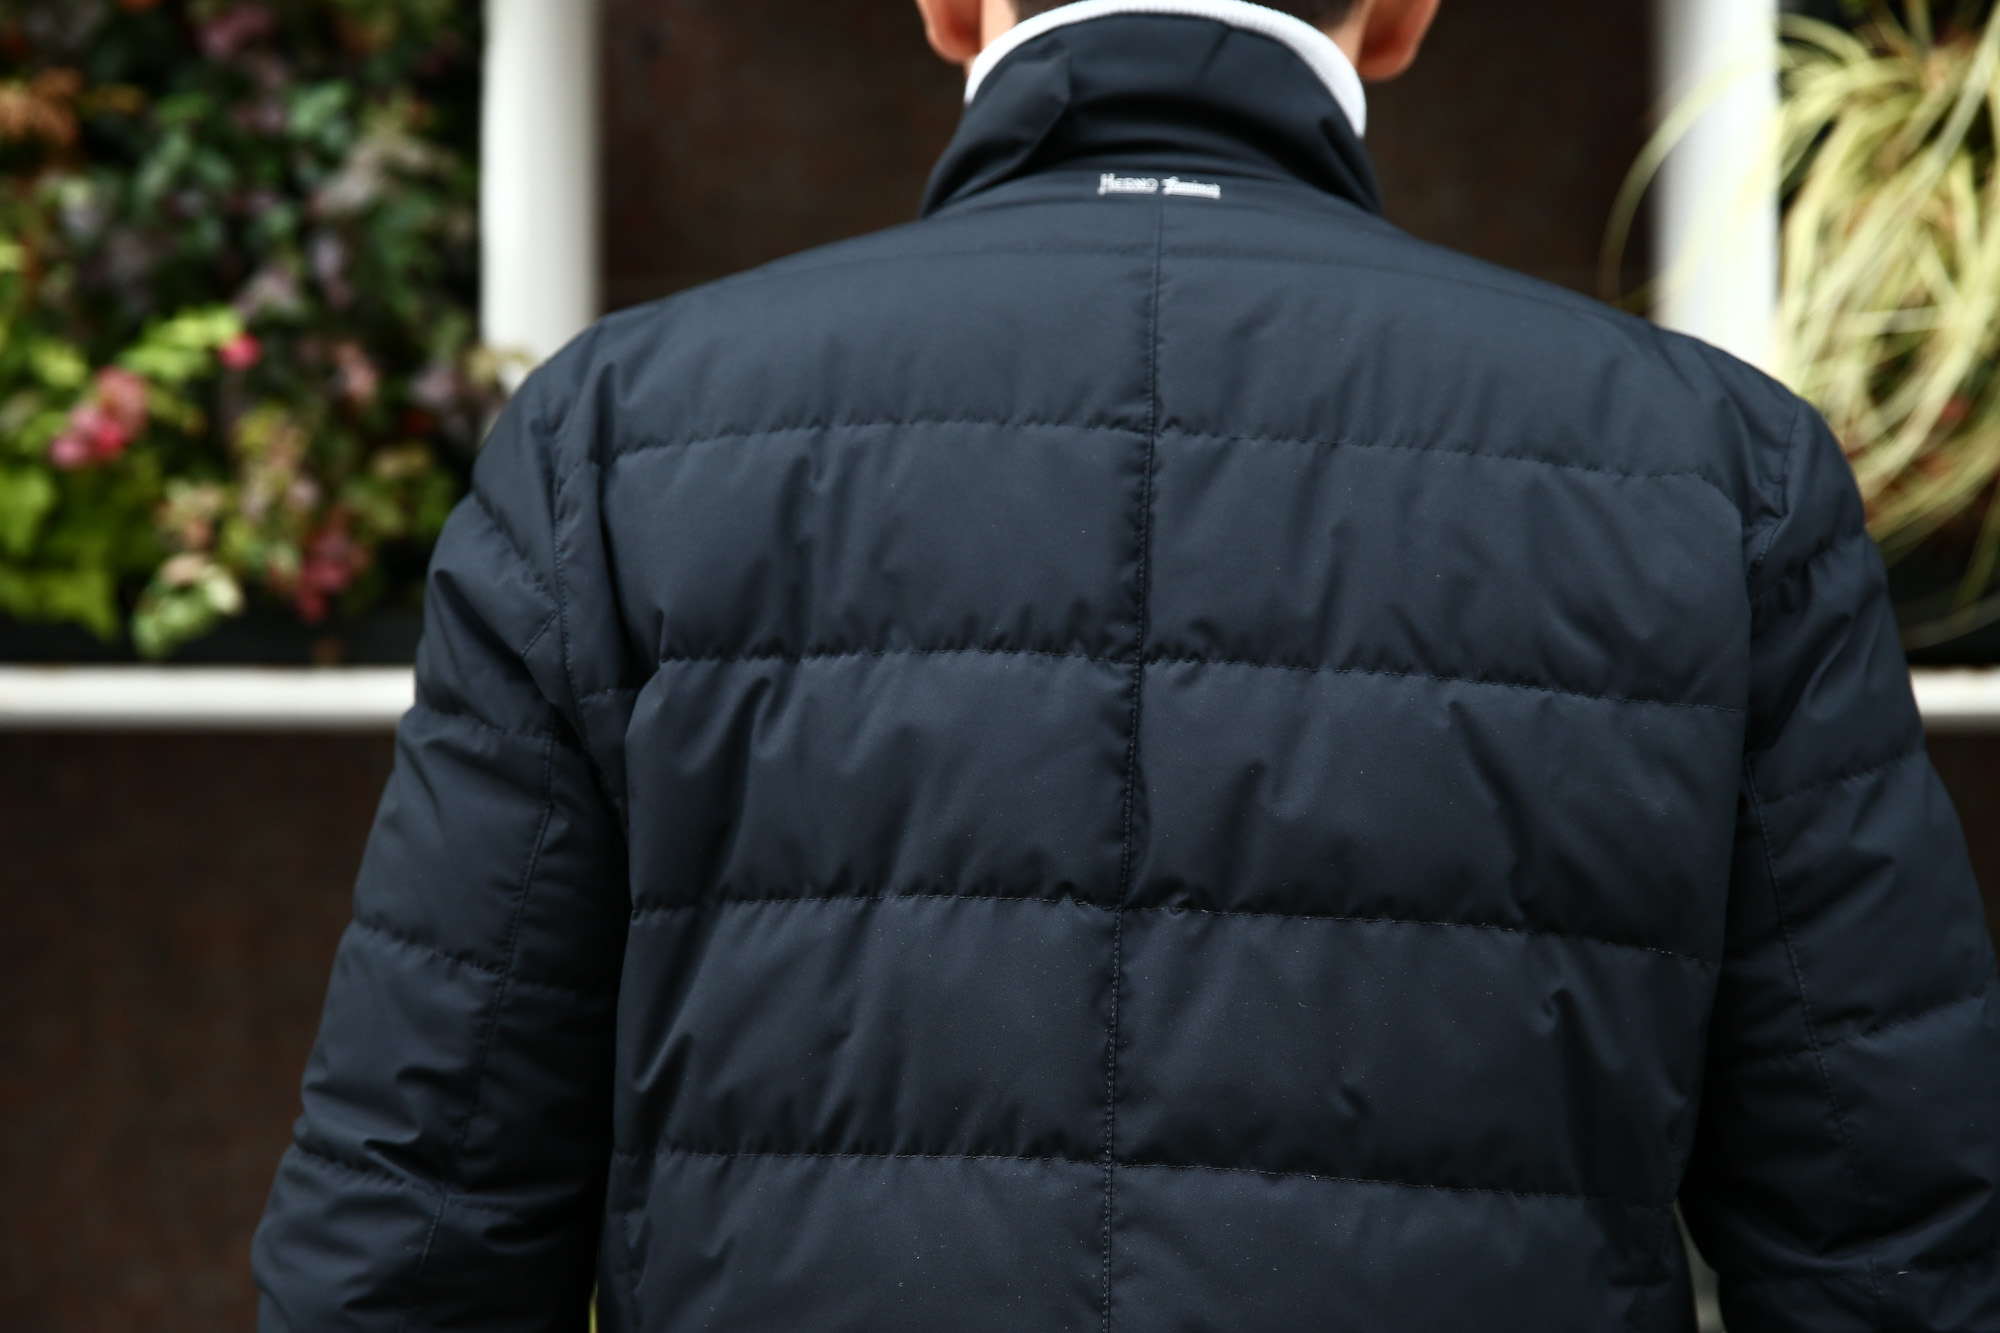 【HERNO / ヘルノ】 PI006UL LAMINAR Down Jacket ラミナー ダウンジャケット GORE-TEX ゴアテックス GORE WINDSTOPPER ゴアウィンドストッパー ダウンジャケット BLACK (ブラック・9300) Made in italy (イタリア製) 2017 秋冬新作 愛知 名古屋 herno ヘルノ ラミナージャケット 42,44,46,48,50,52,54